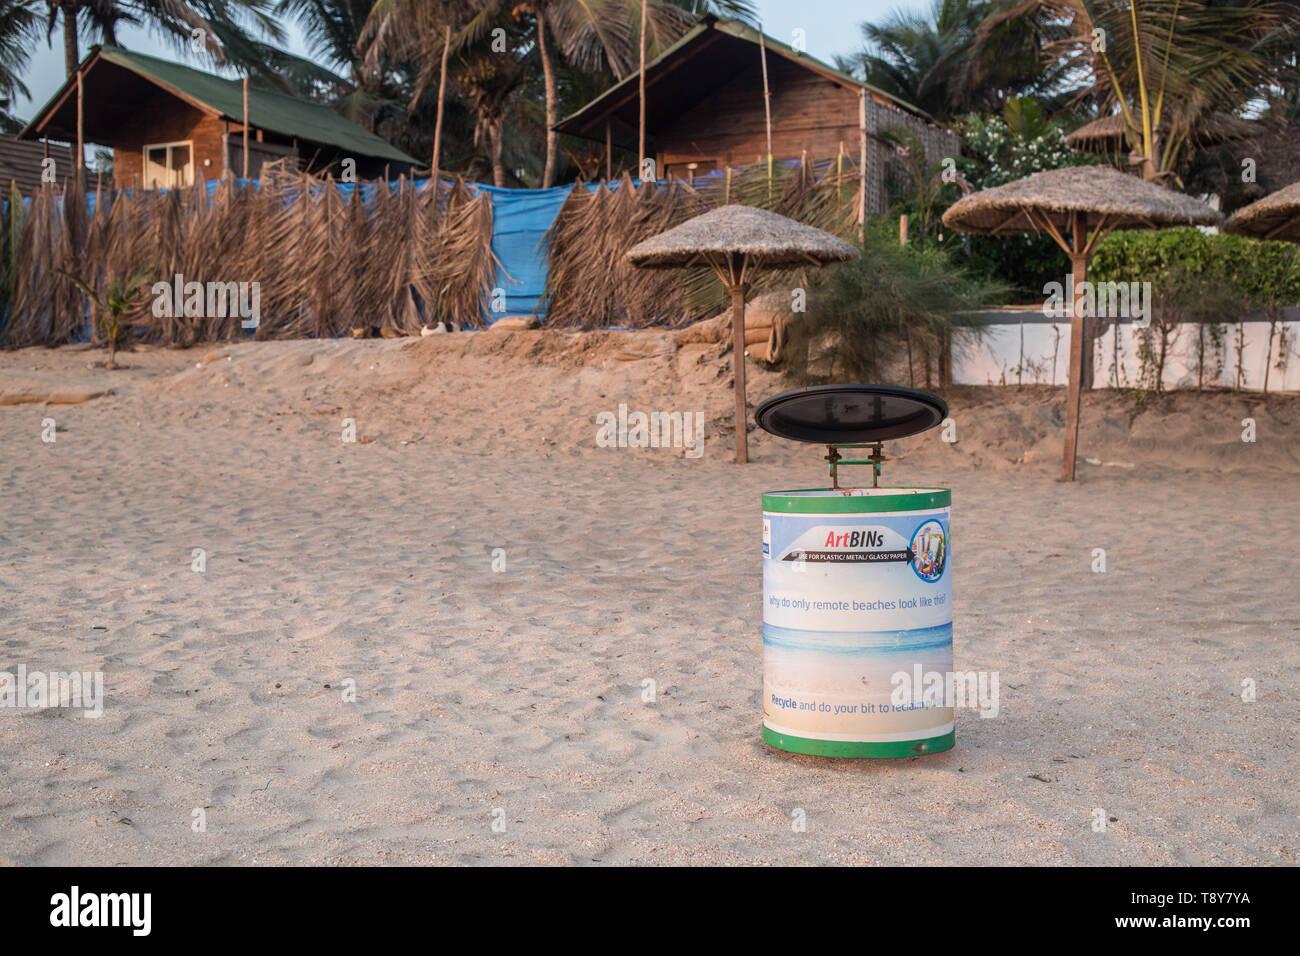 Garbage bins for trash on Agonda Beach in Goa, India, at sunset. - Stock Image